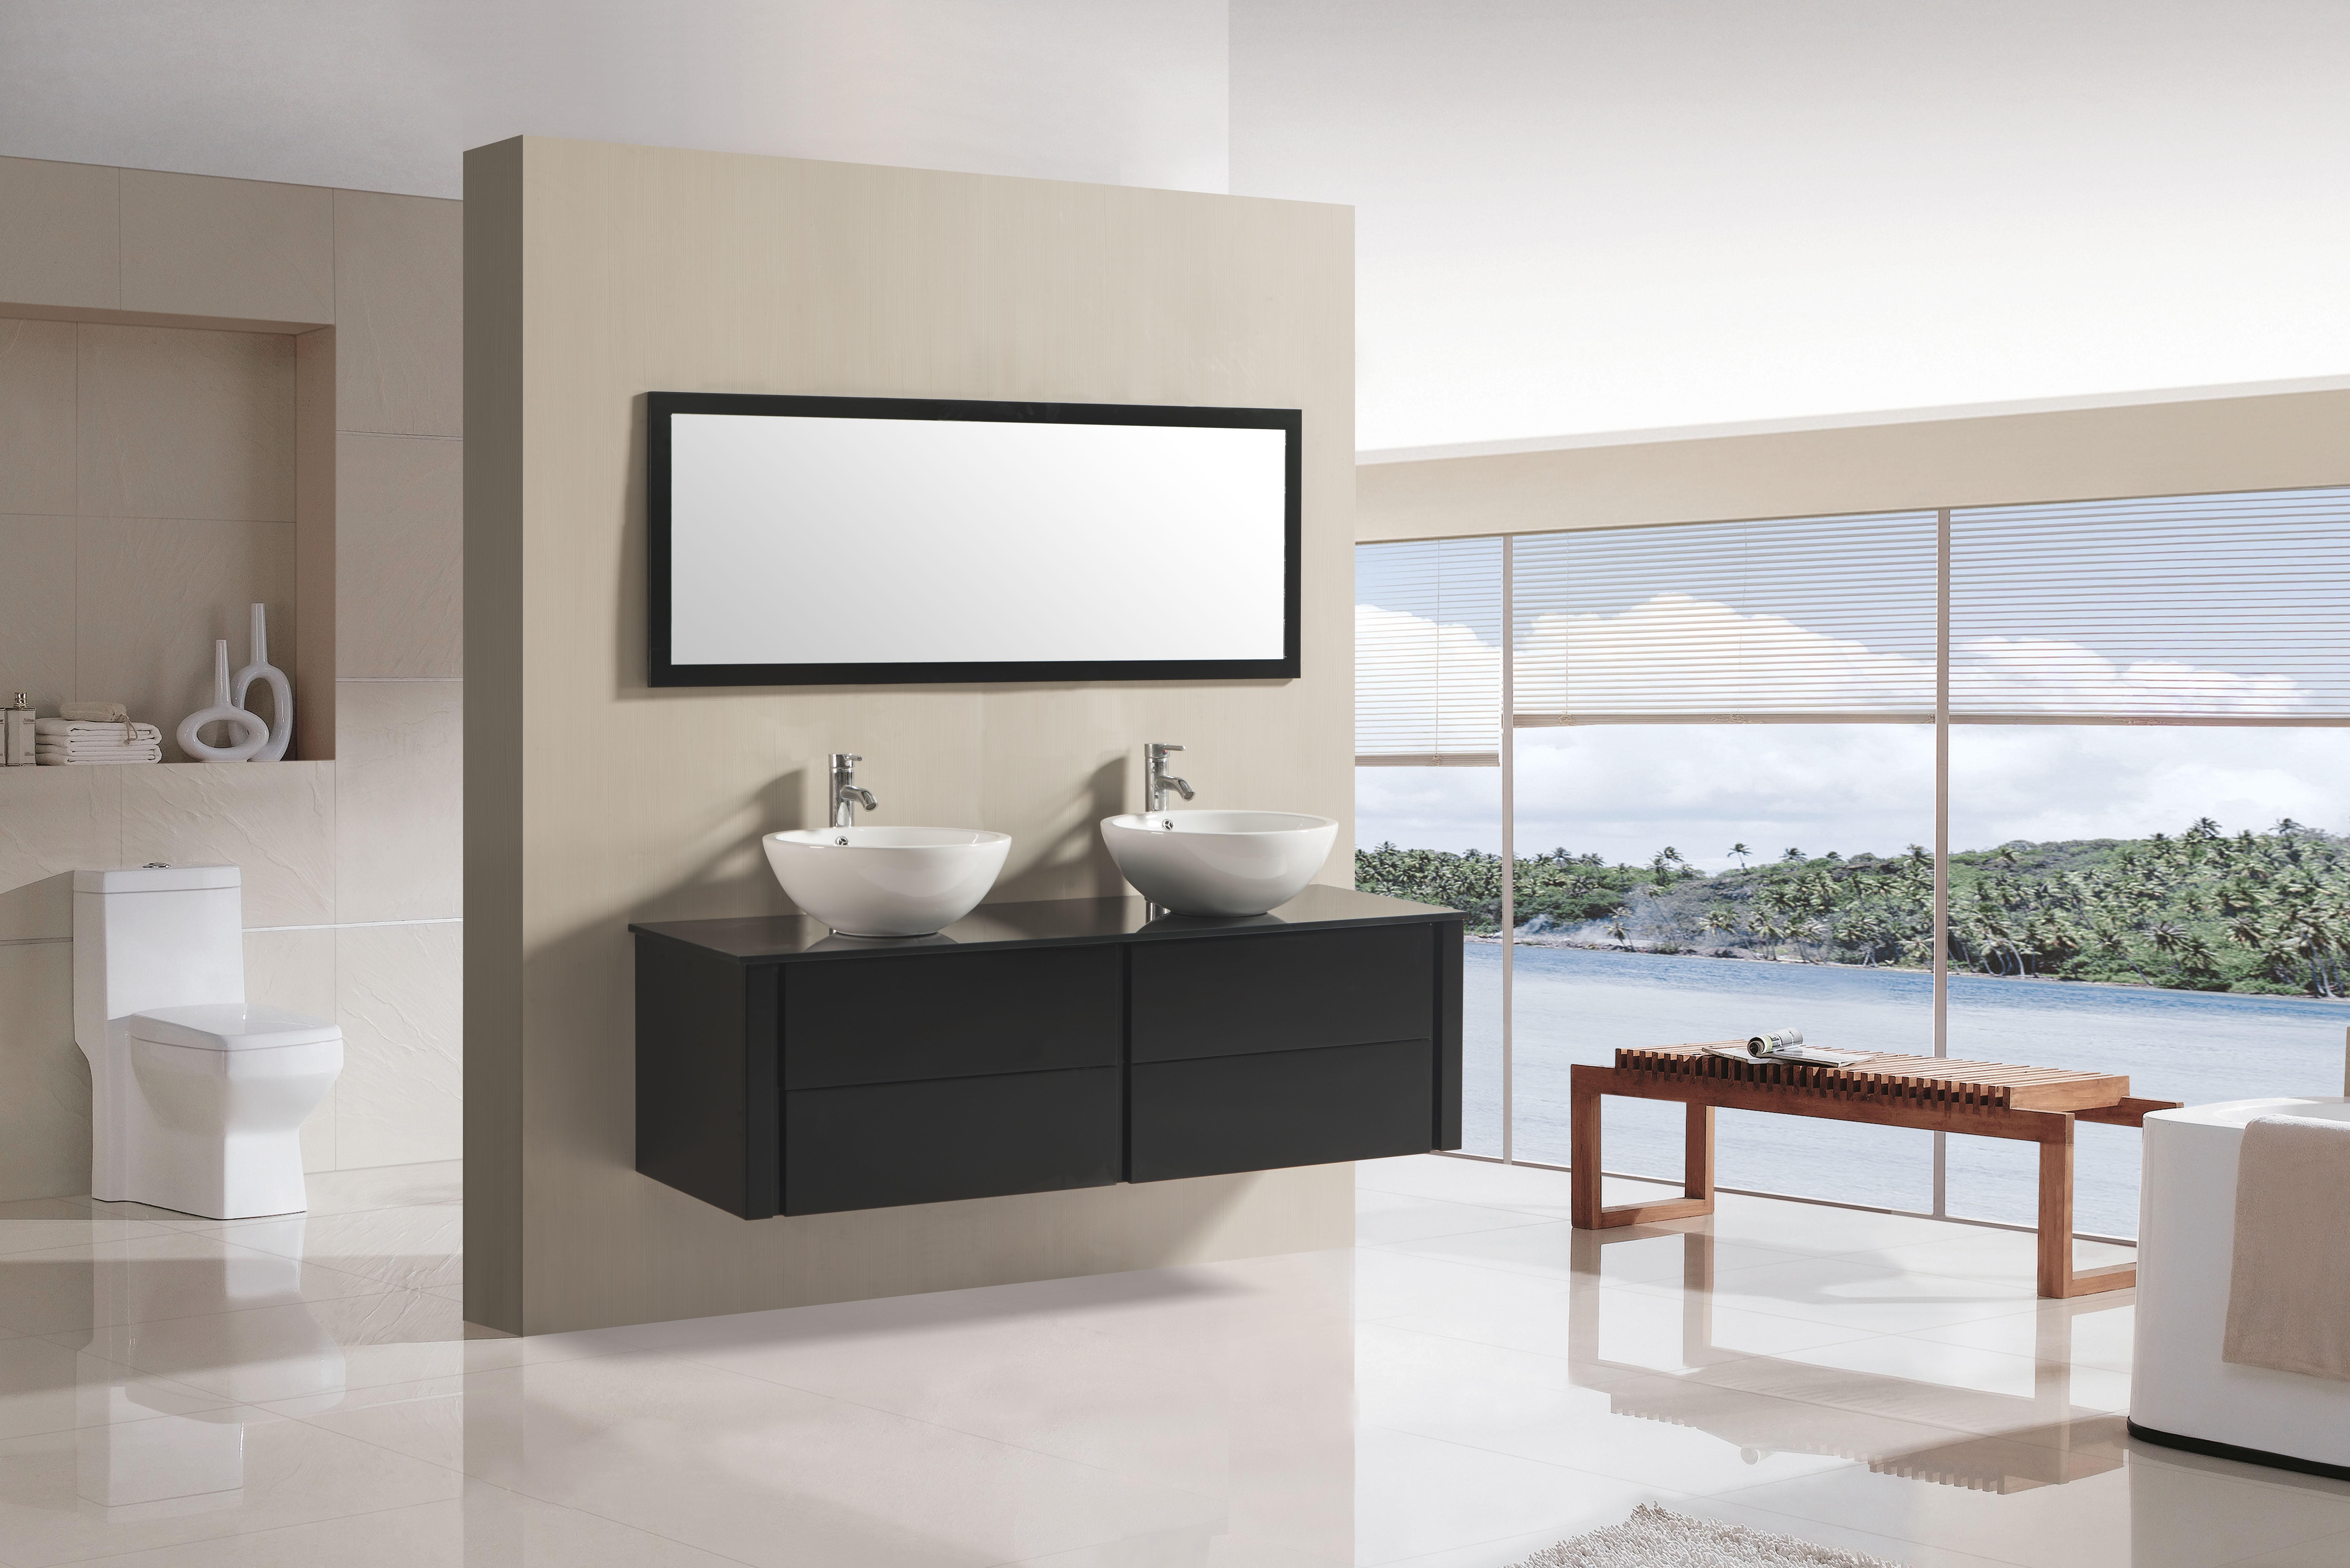 Zwevend badkamermeubel in een kleine badkamer   Online Sanitair